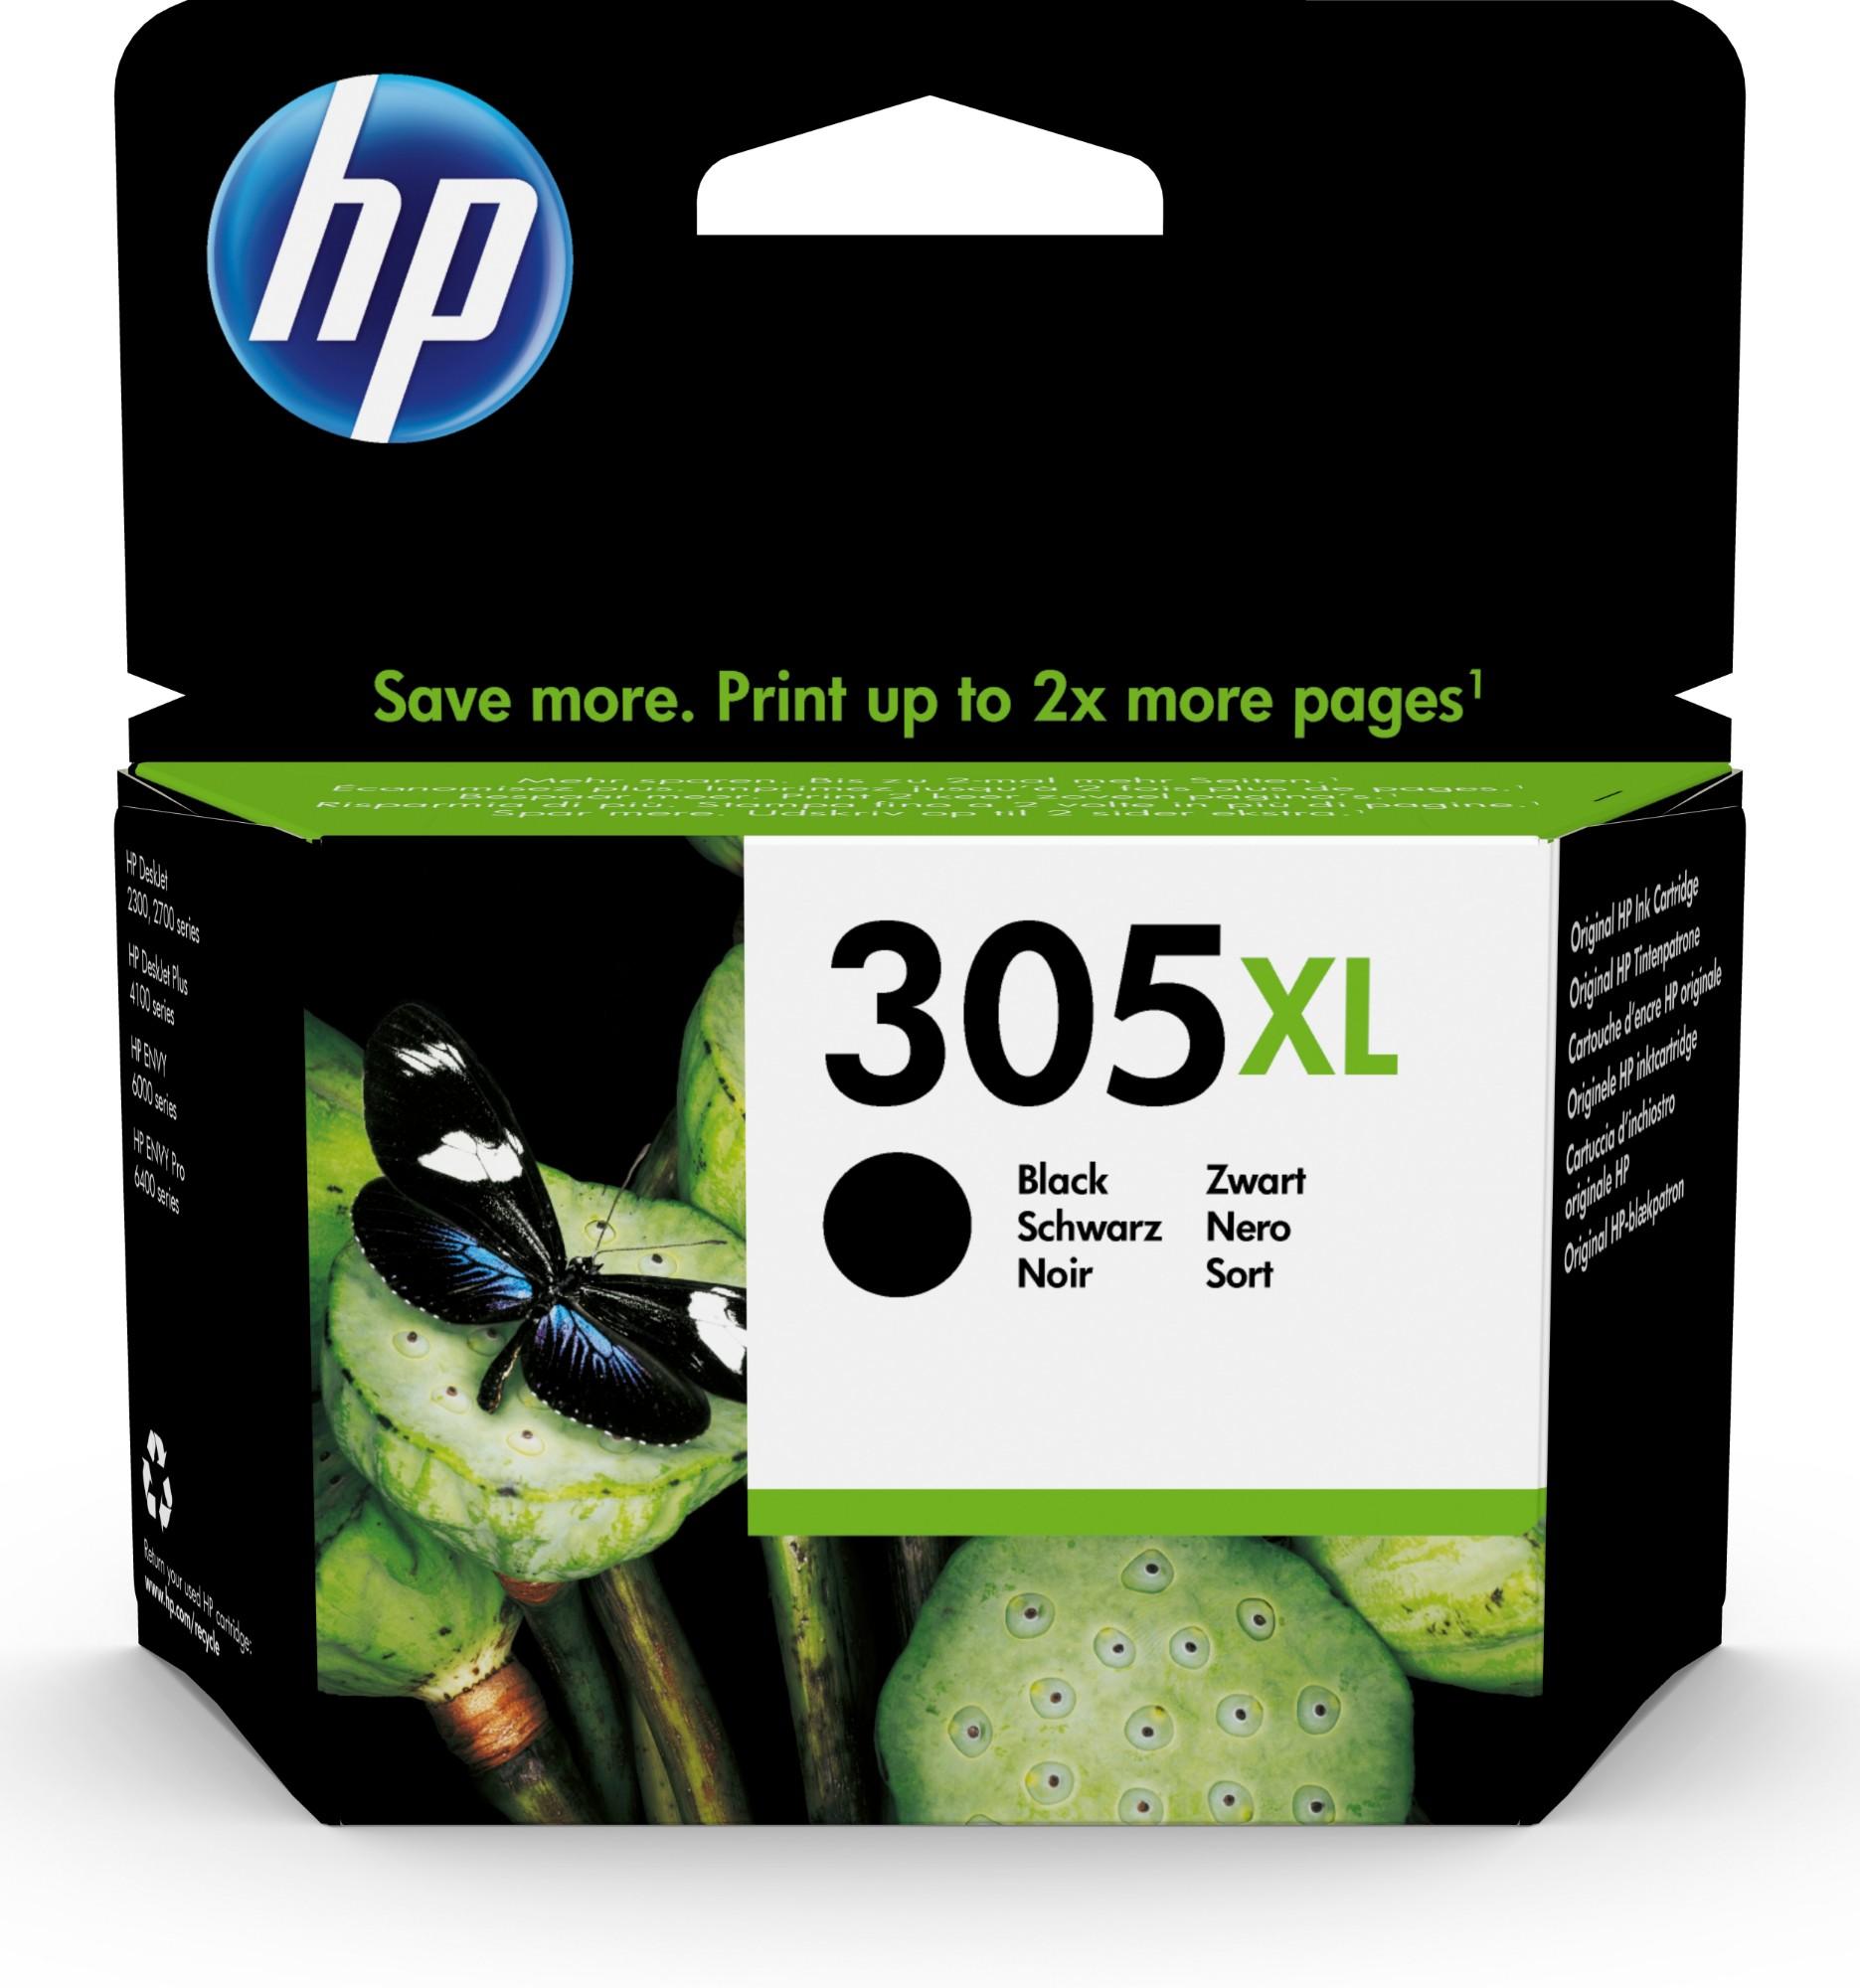 Original HP 305XL Black High Capacity Inkjet Cartridge 3YM62AE